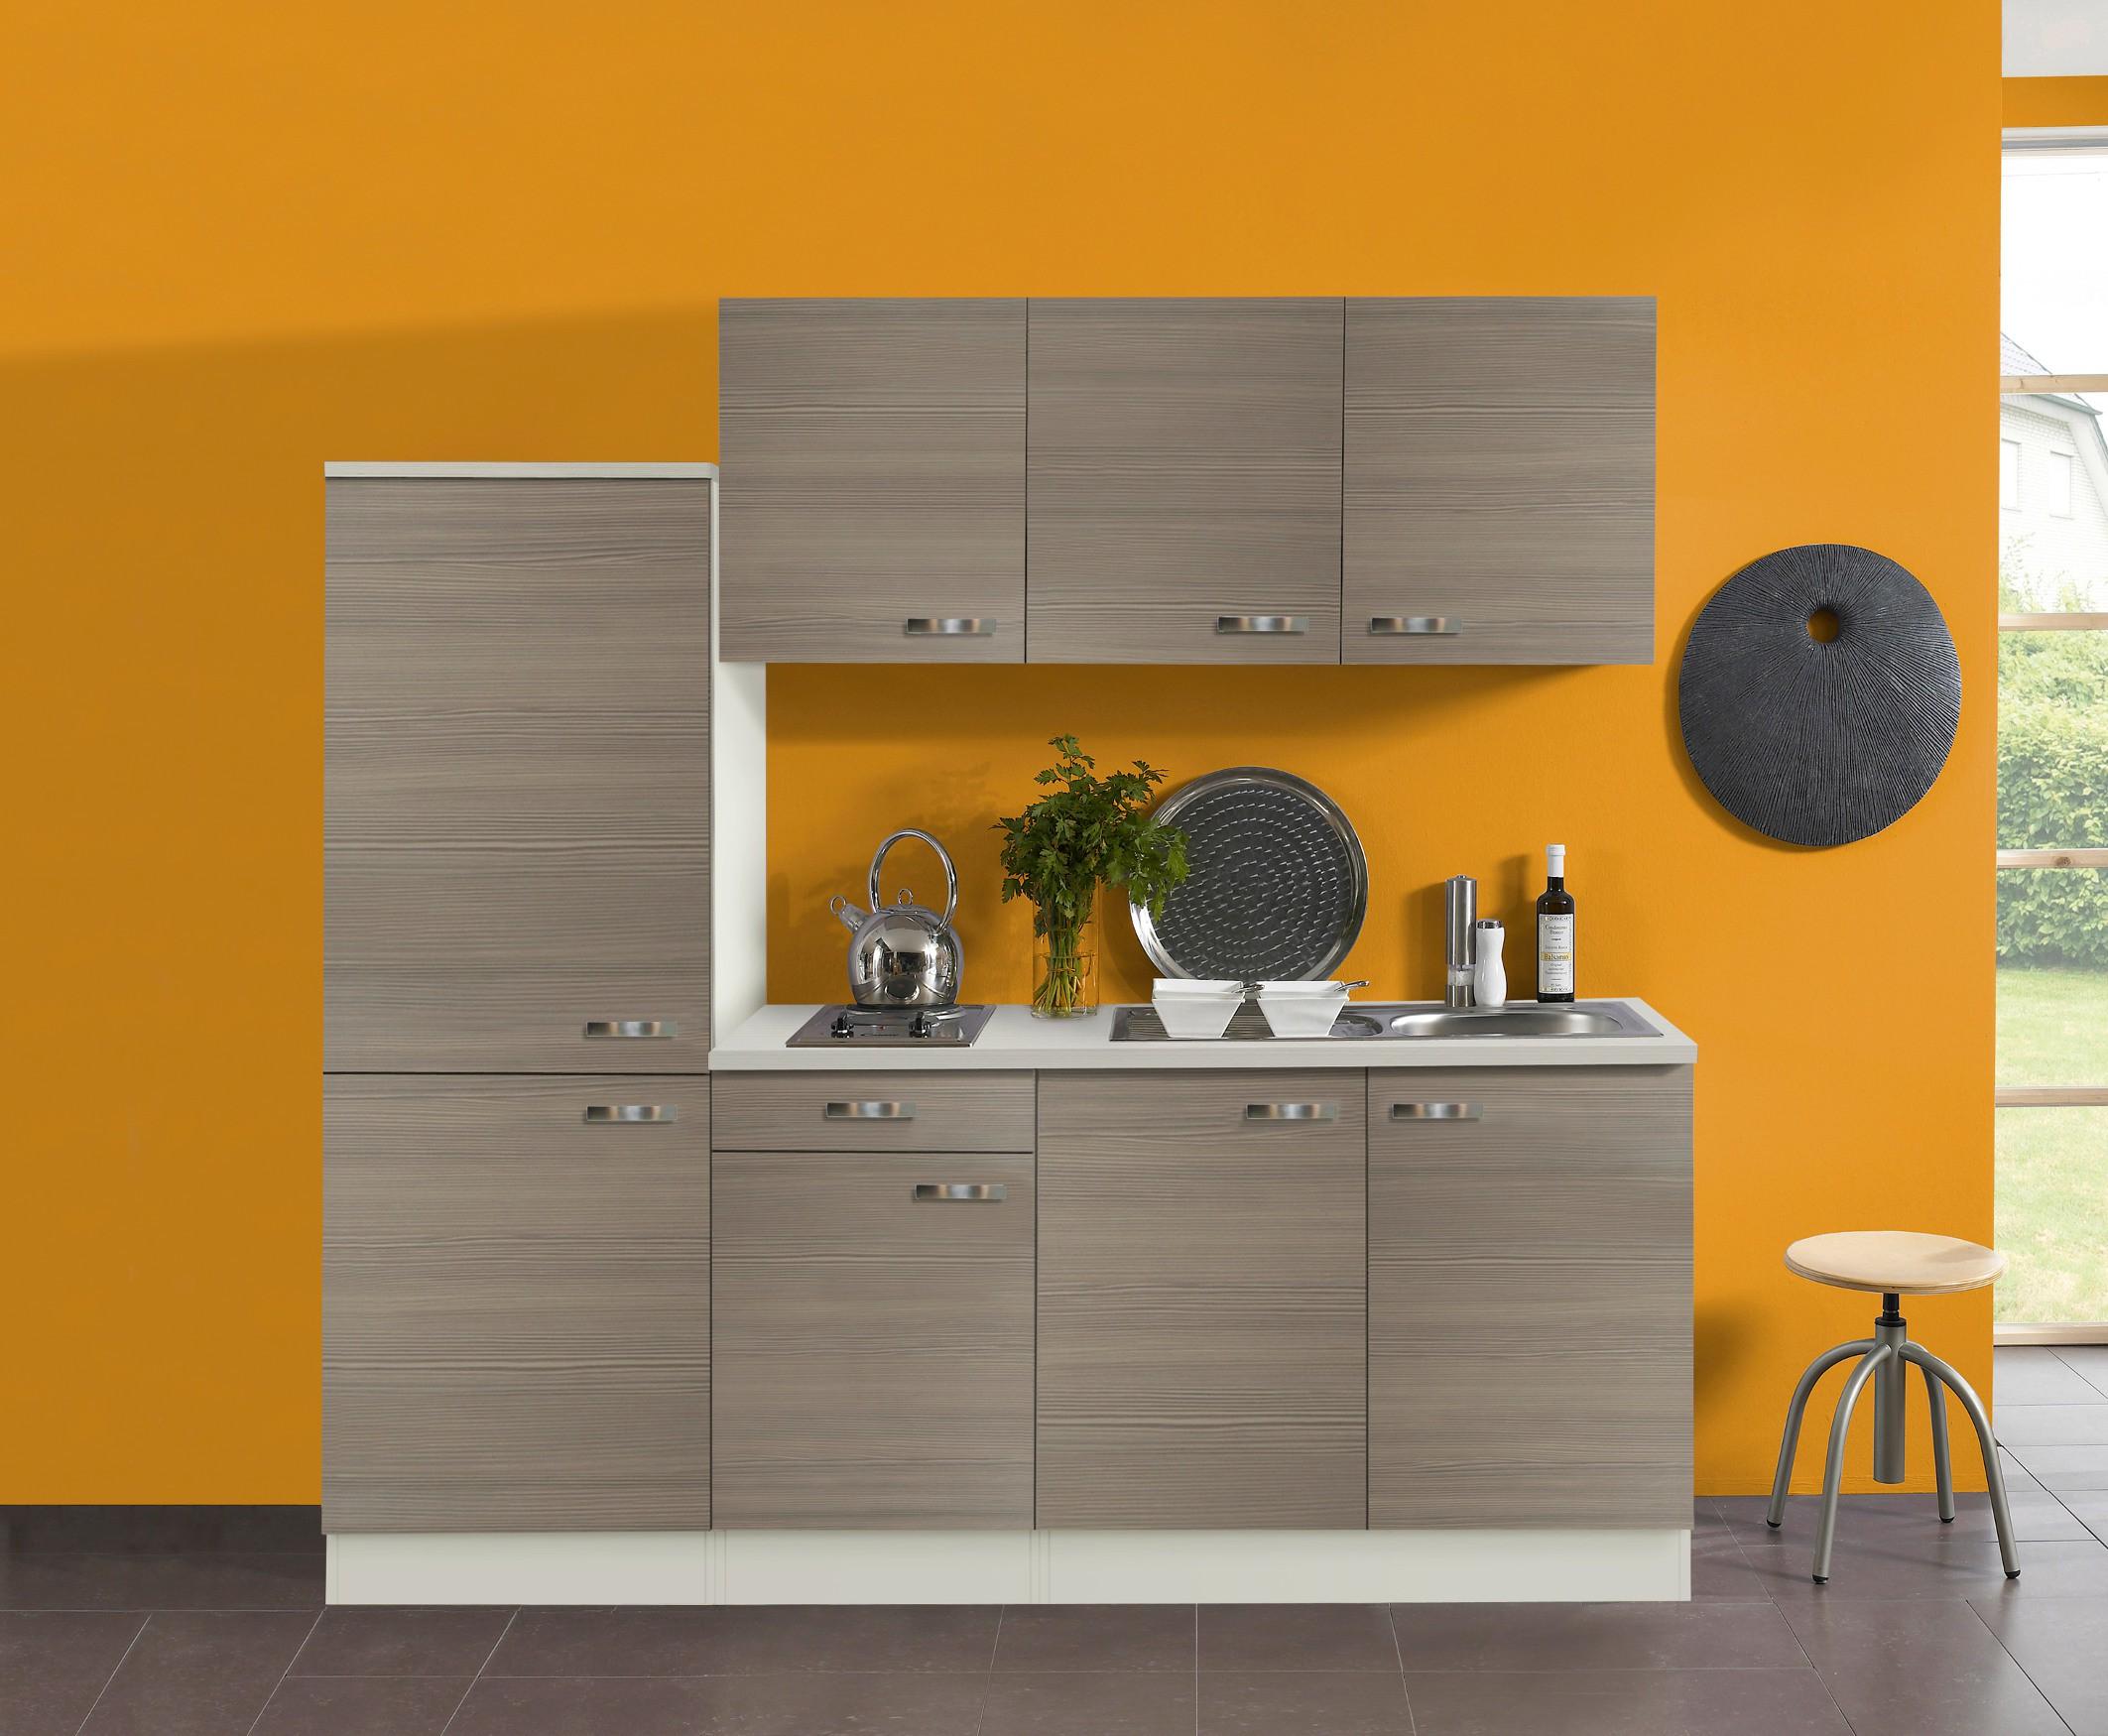 Miniküche Mit Kühlschrank Spüle Rechts : Singleküche toledo vario 2 elektro 9 teilig breite 210 cm